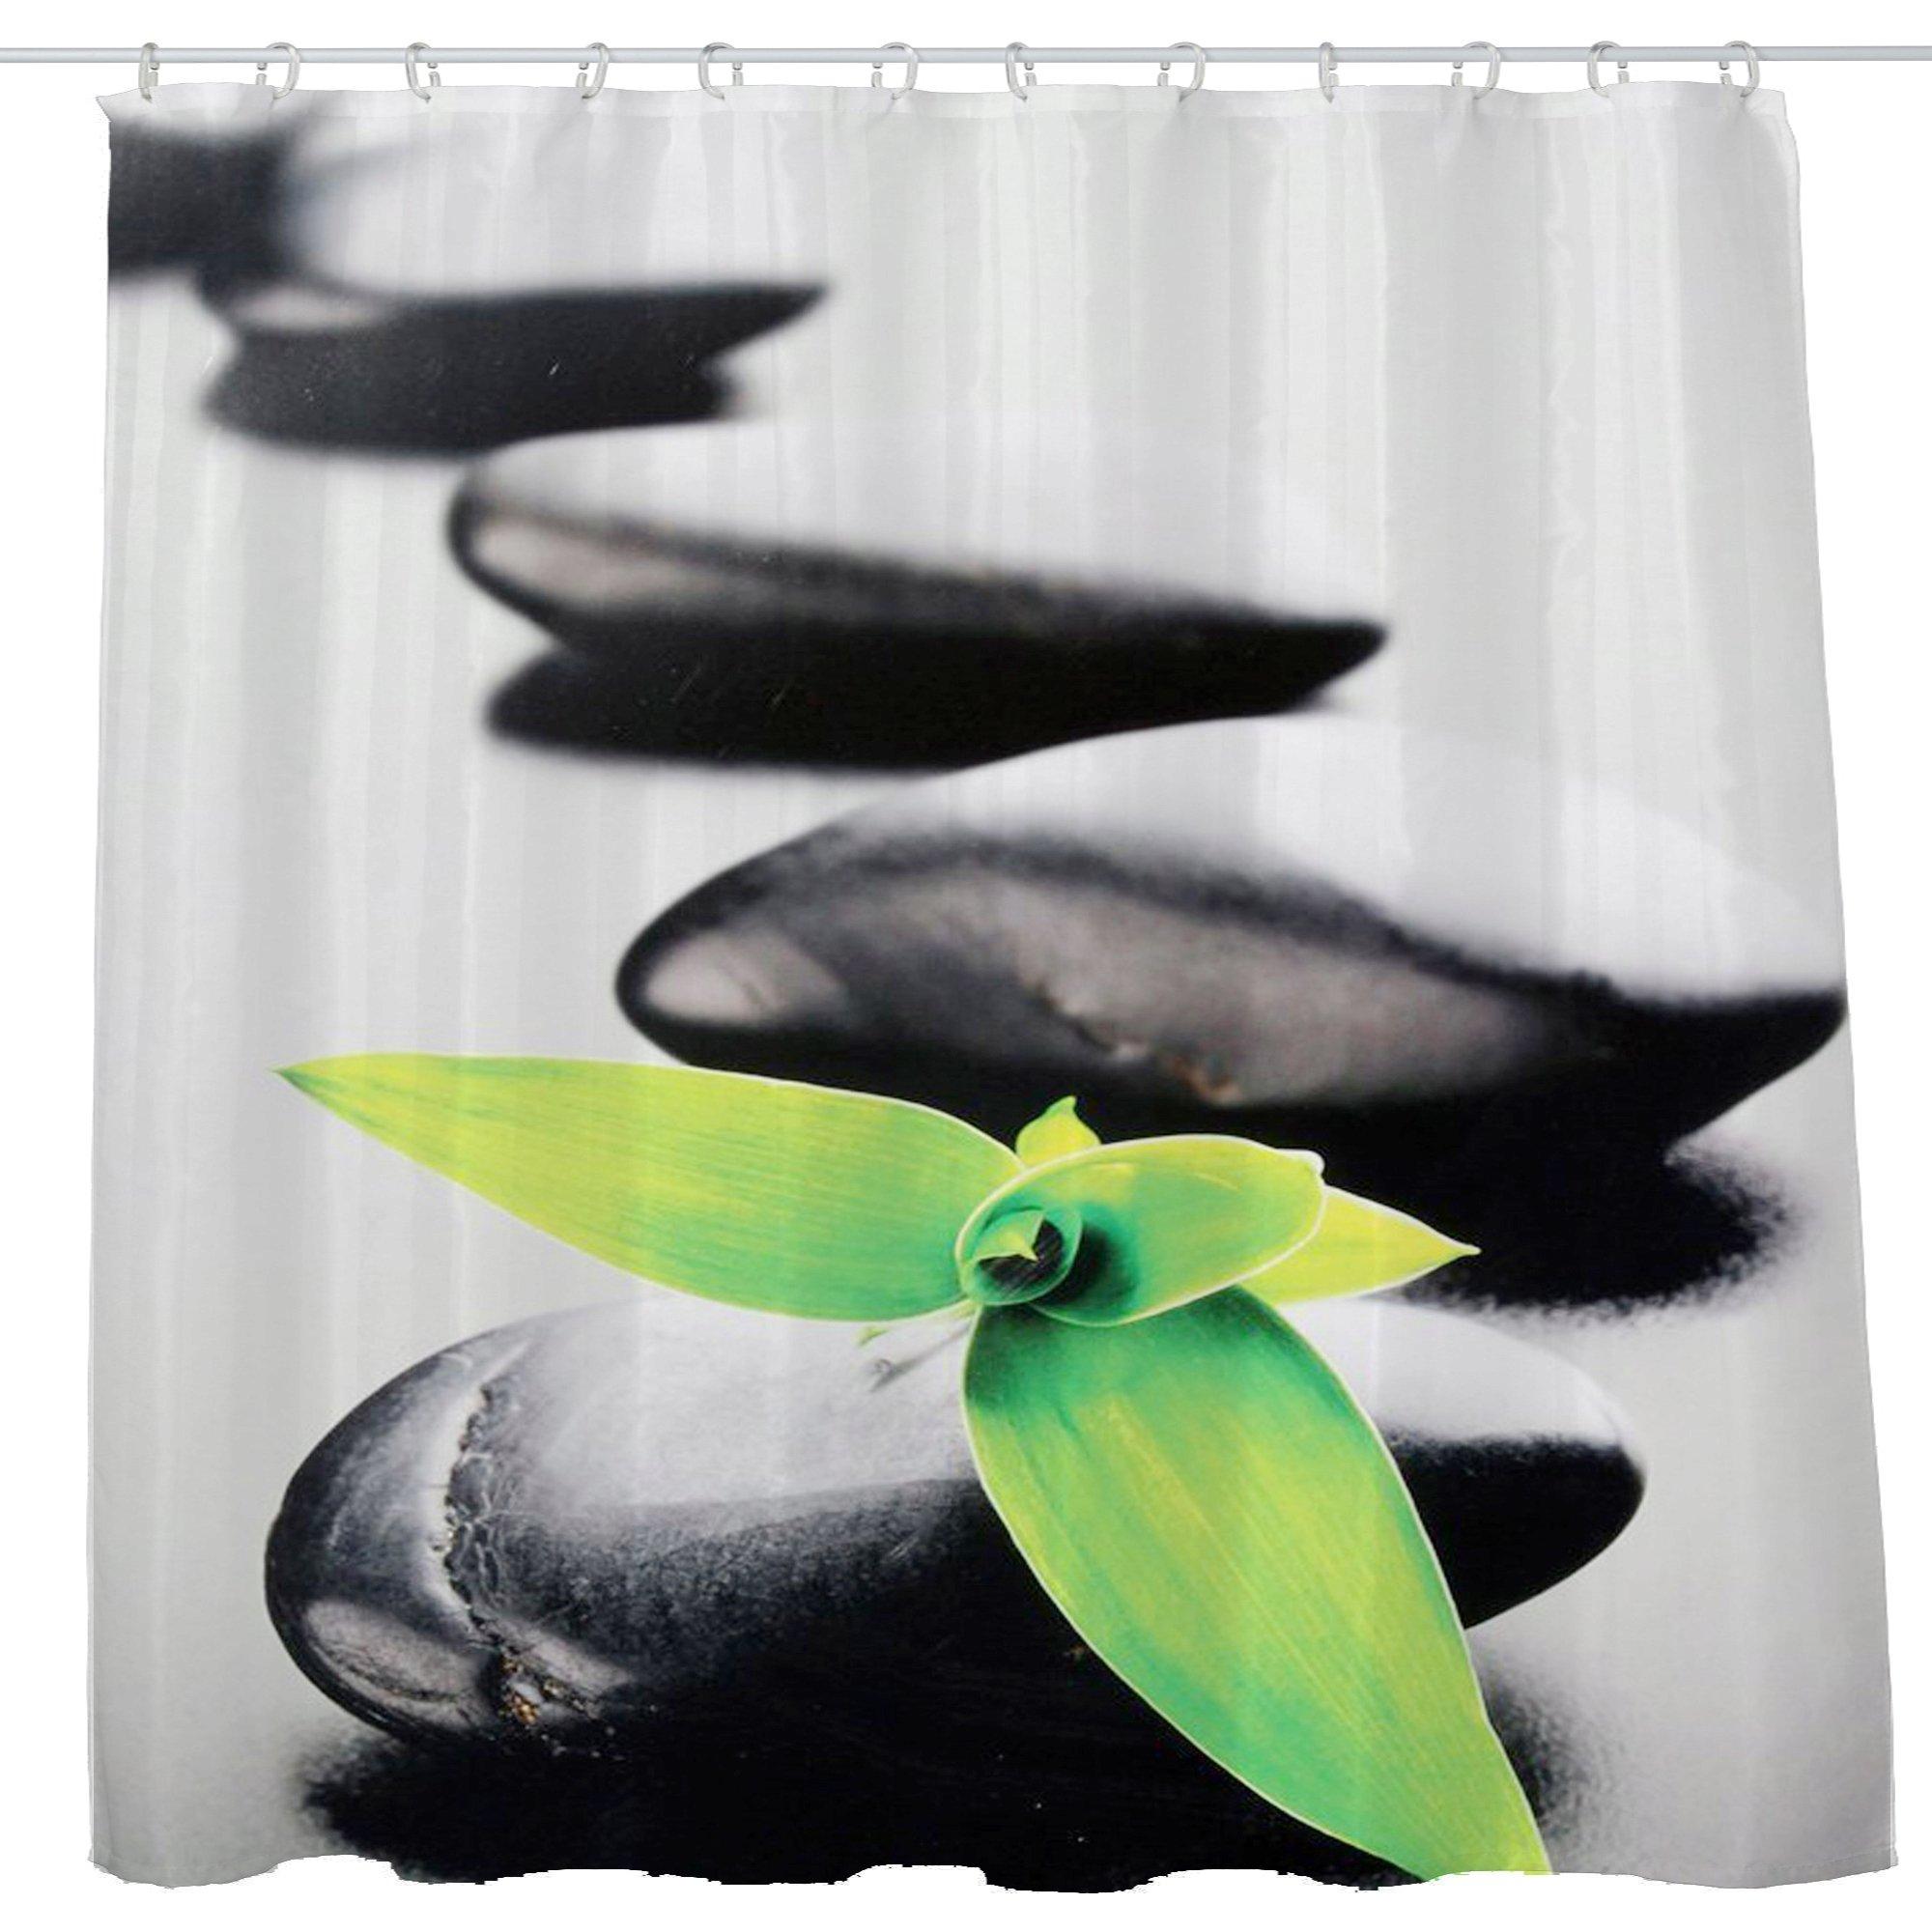 DJSBZ Shower Curtain Waterproof Non-Toxic Polyester Decoration Washing Room 12 Self Grommets Plastic Rings Zen Stone Garden Rocks Spa Bamboo Fountain Yoga 72x72 inch (180x180cm) (08)